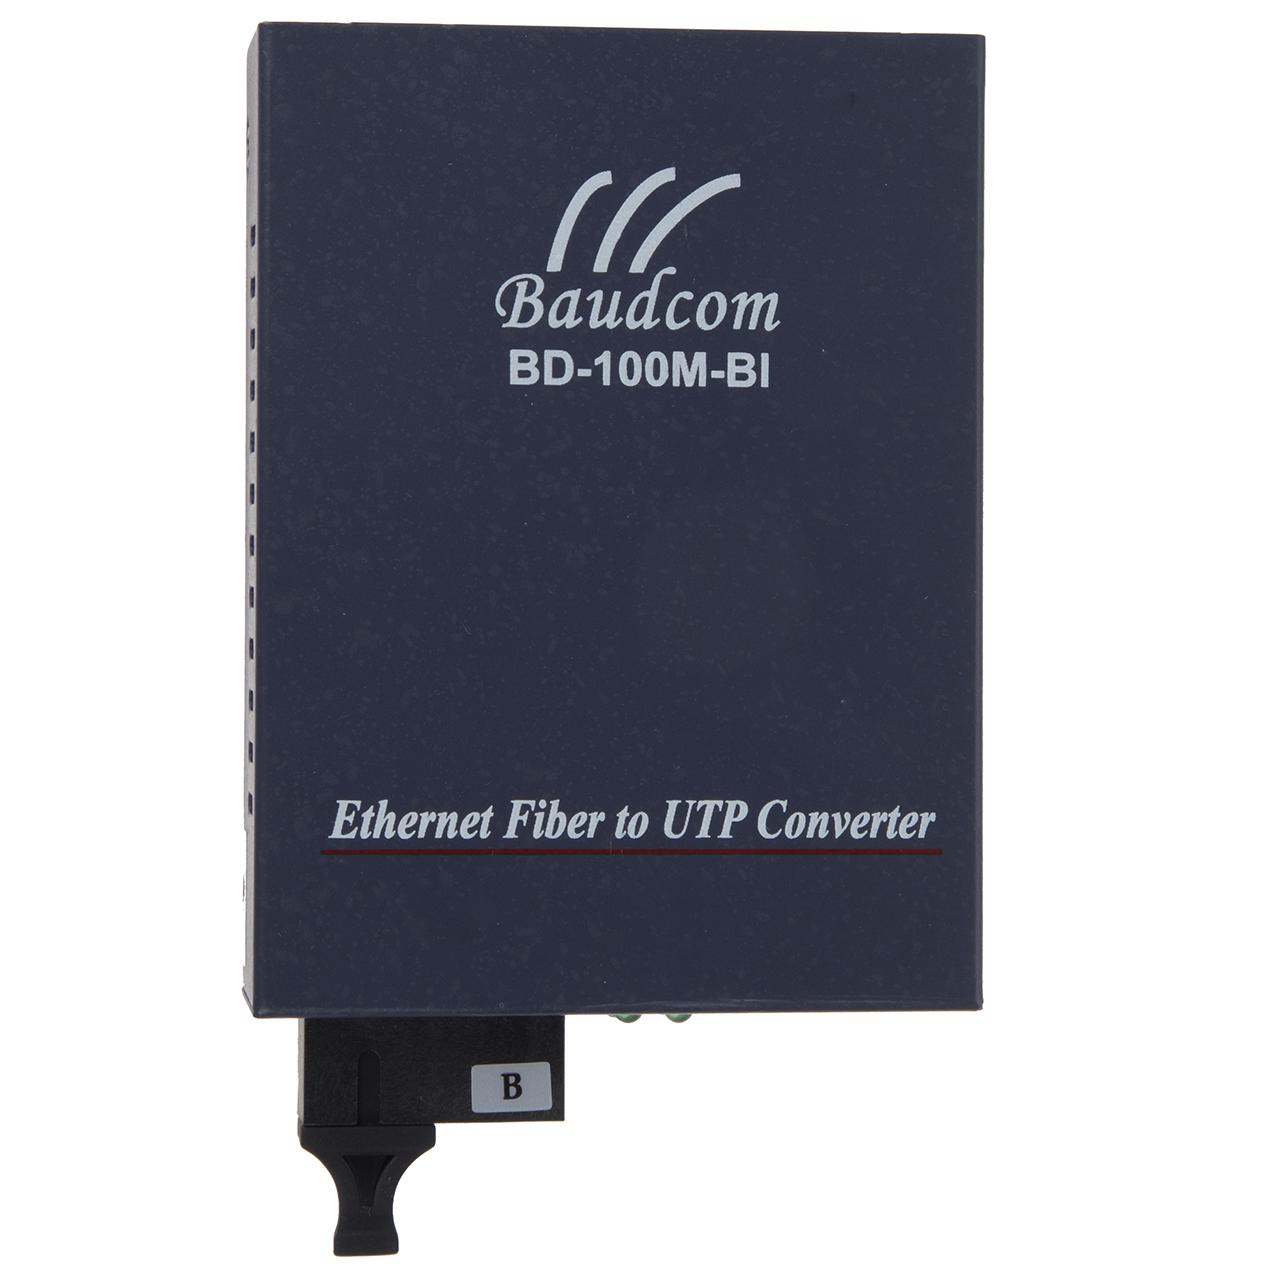 مبدل فیبر نوری به اترنت تک حالته بادکام مدل BD-100M-BI Tx1550nm